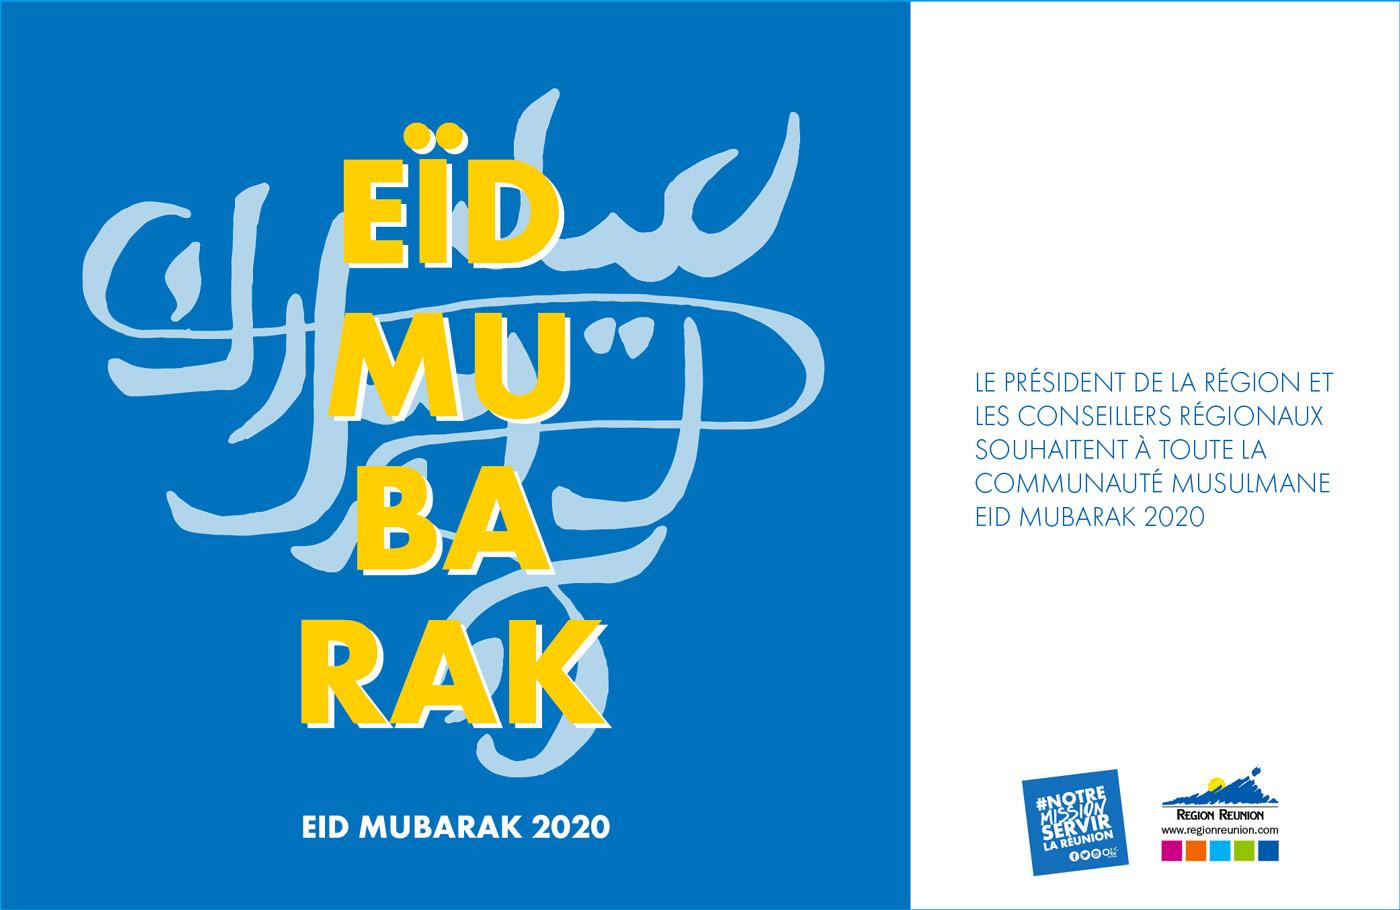 Eïd Mubarak